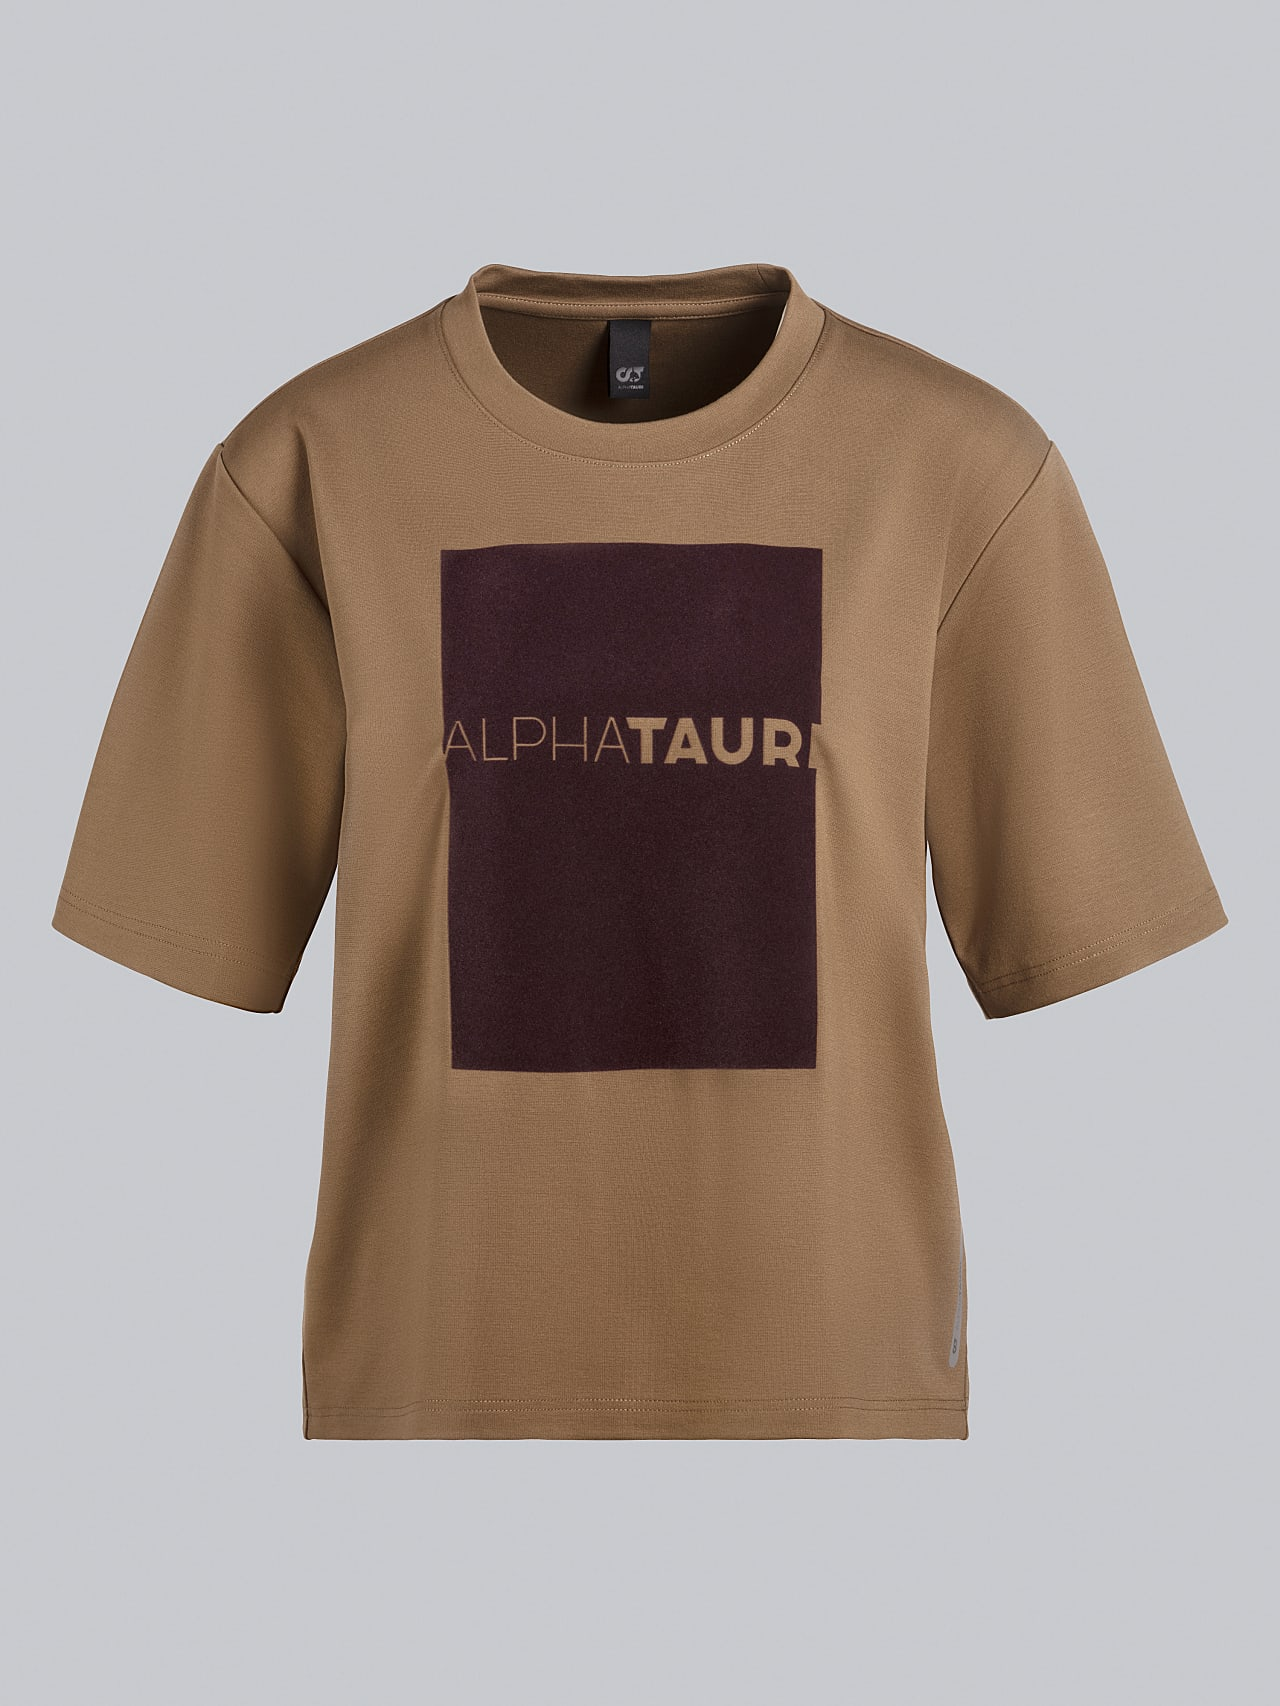 JASHU V1.Y5.02 Heavy-Weight Logo T-Shirt gold Back Alpha Tauri